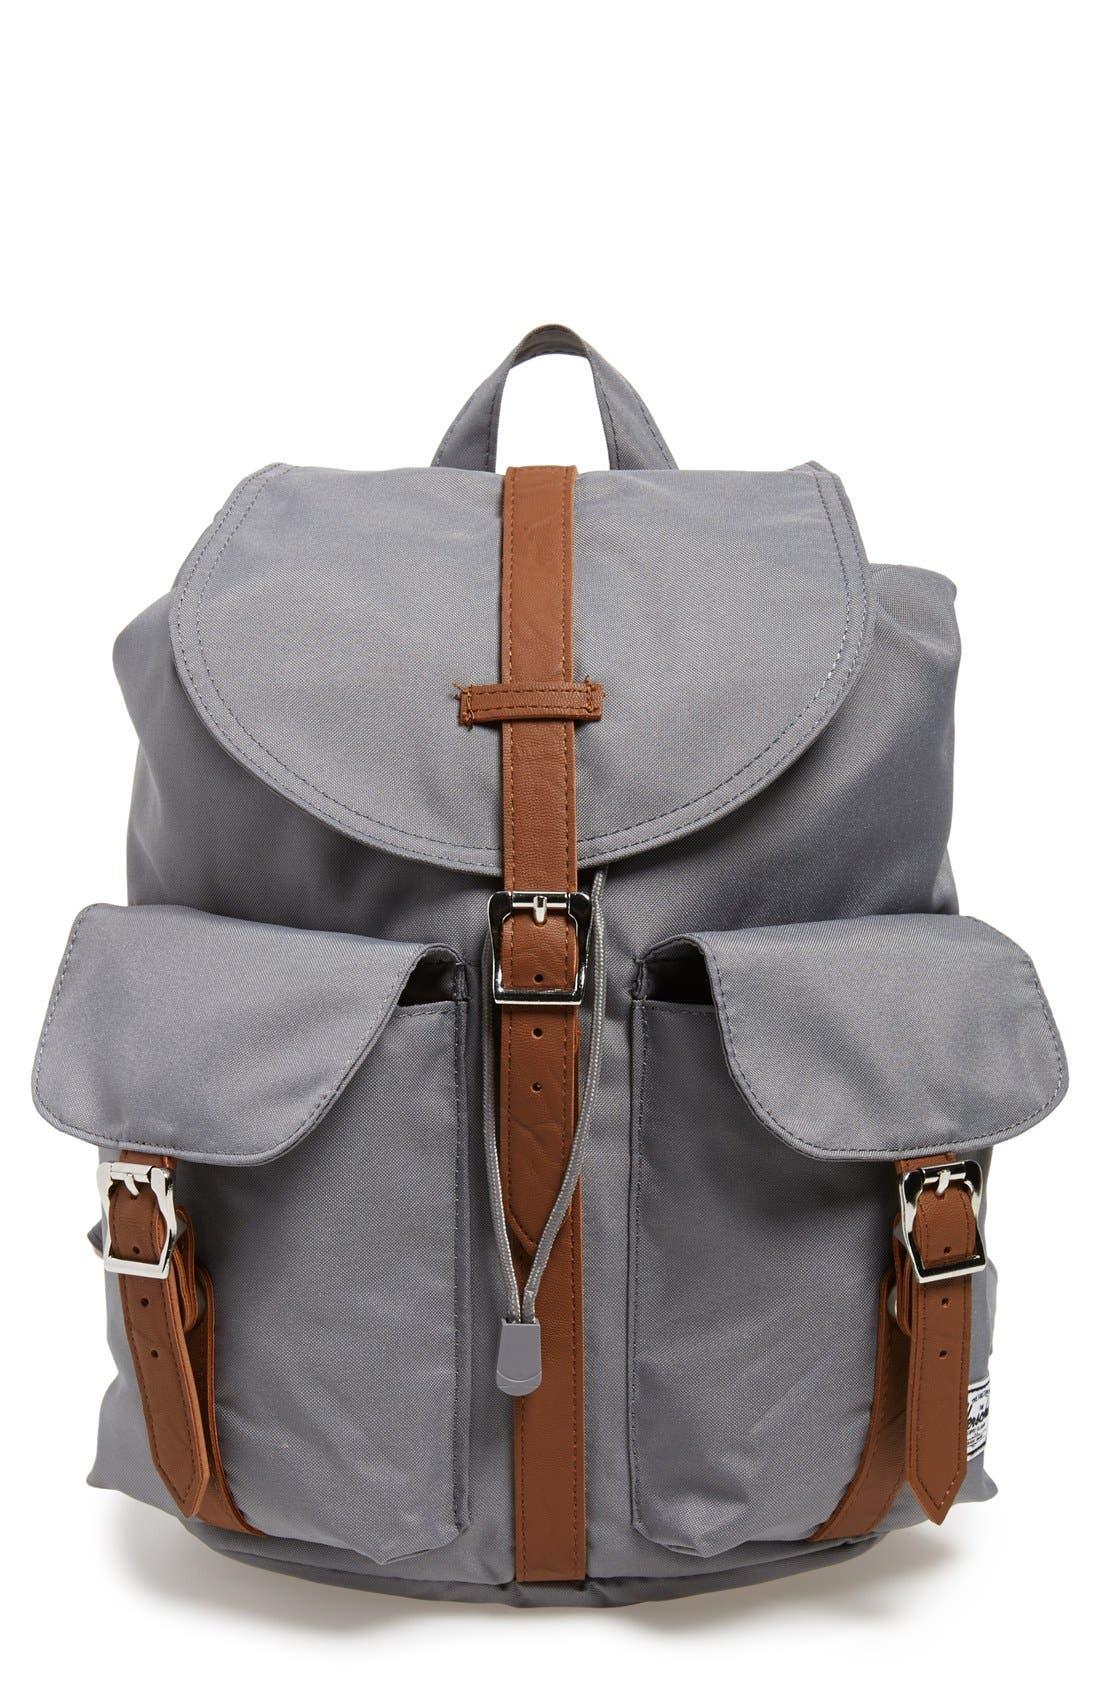 Alternate Image 1 Selected - Herschel Supply Co. 'Dawson - Mid Volume' Backpack